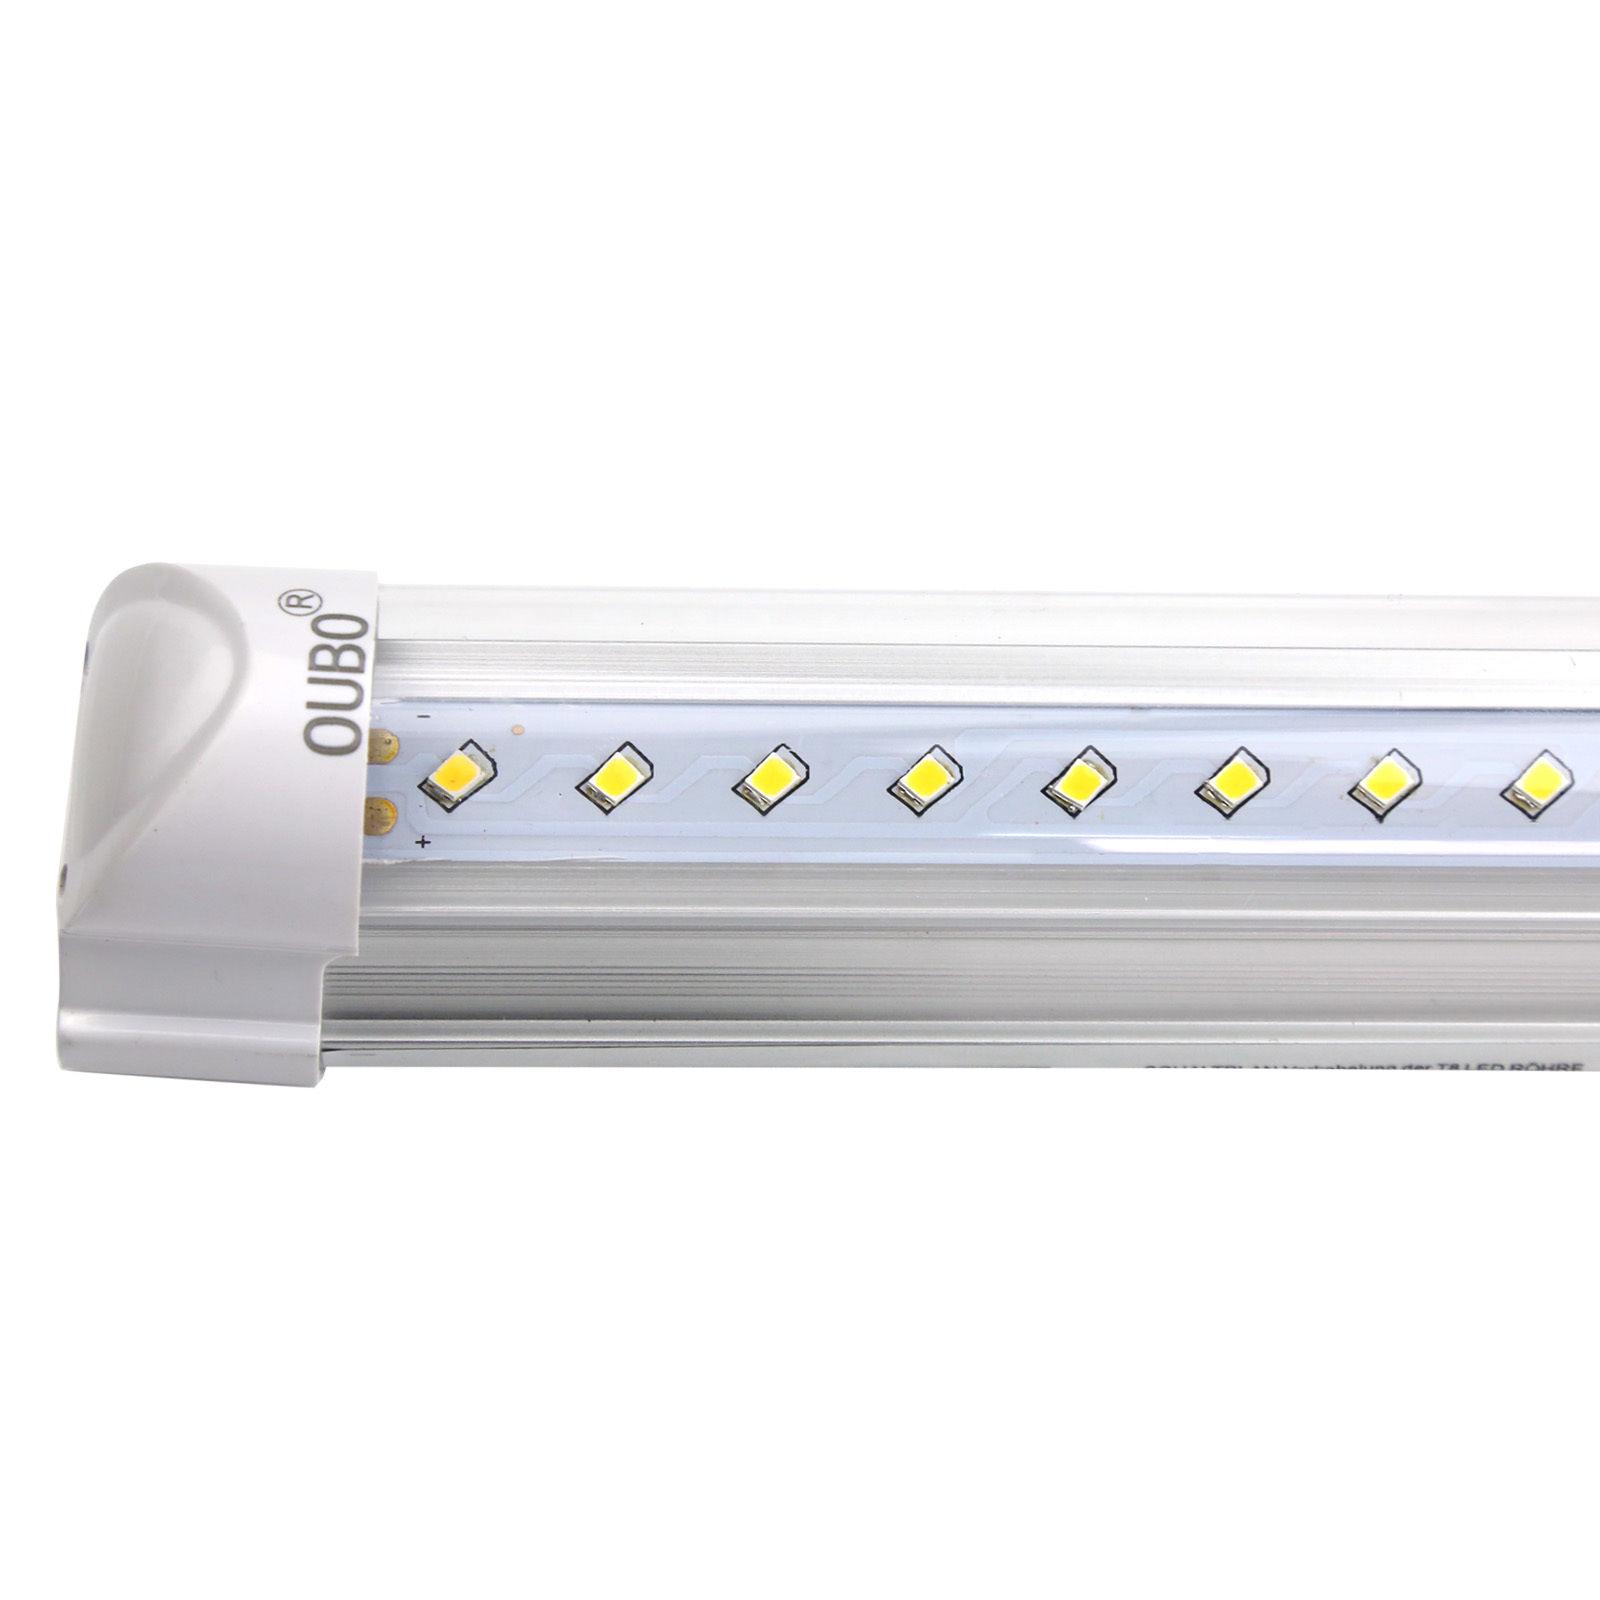 led leuchtstoffr hre komplett 150cm 120cm t8 lichtleiste. Black Bedroom Furniture Sets. Home Design Ideas